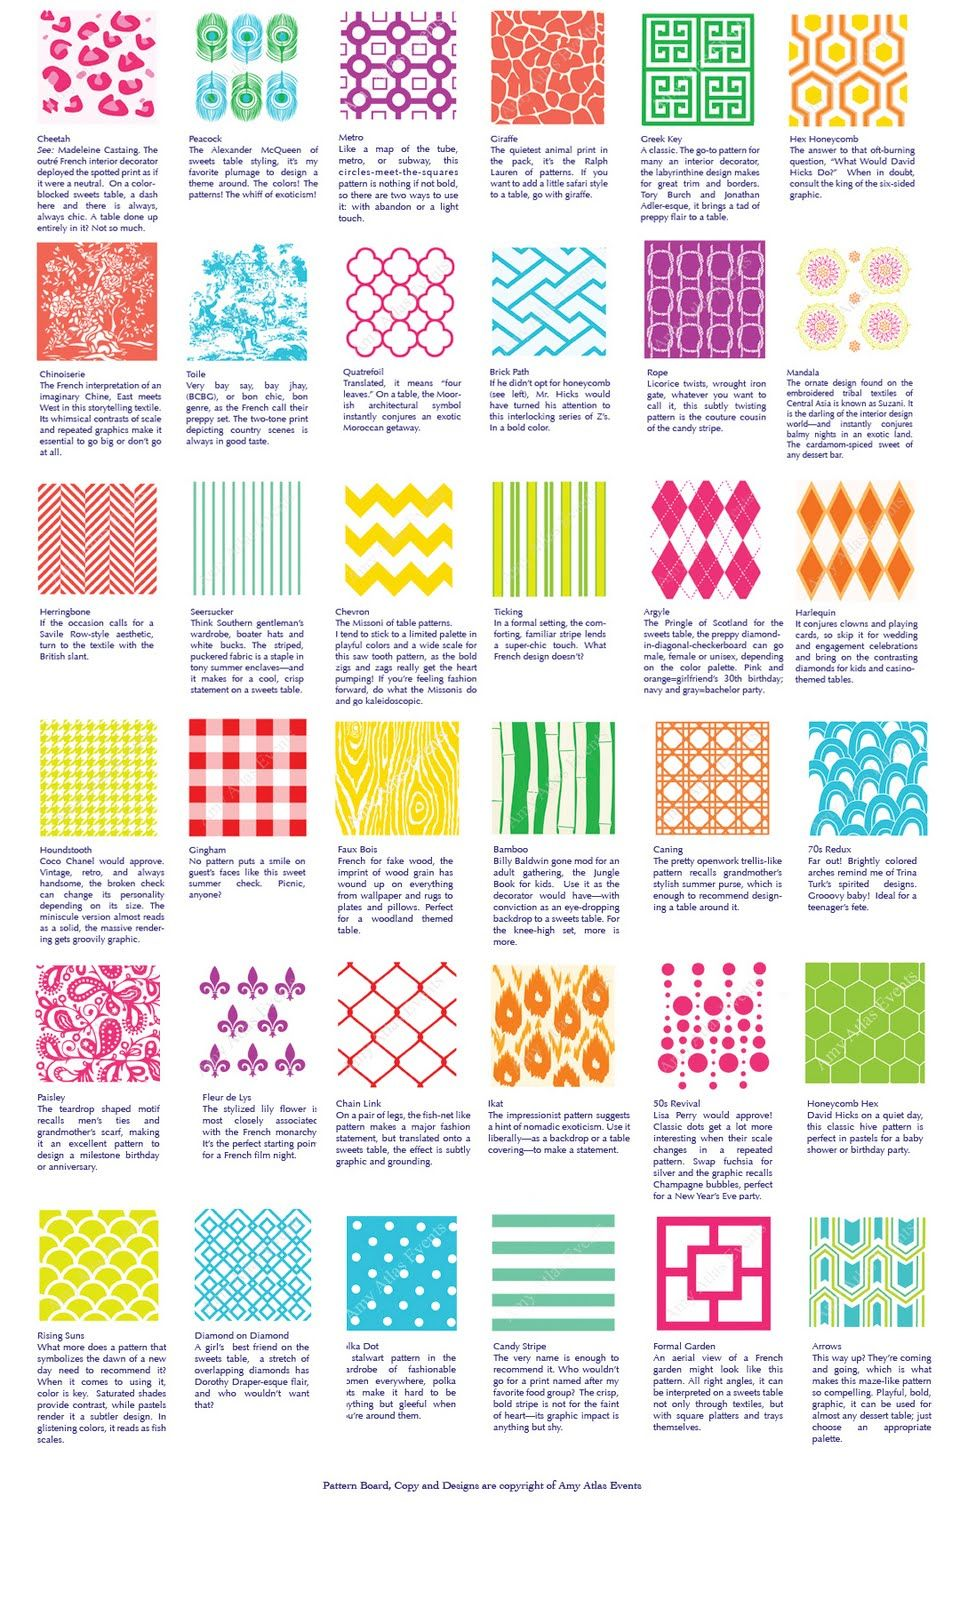 thimble design blog amy atlas pattern board cheat sheet patterns designs pinterest. Black Bedroom Furniture Sets. Home Design Ideas